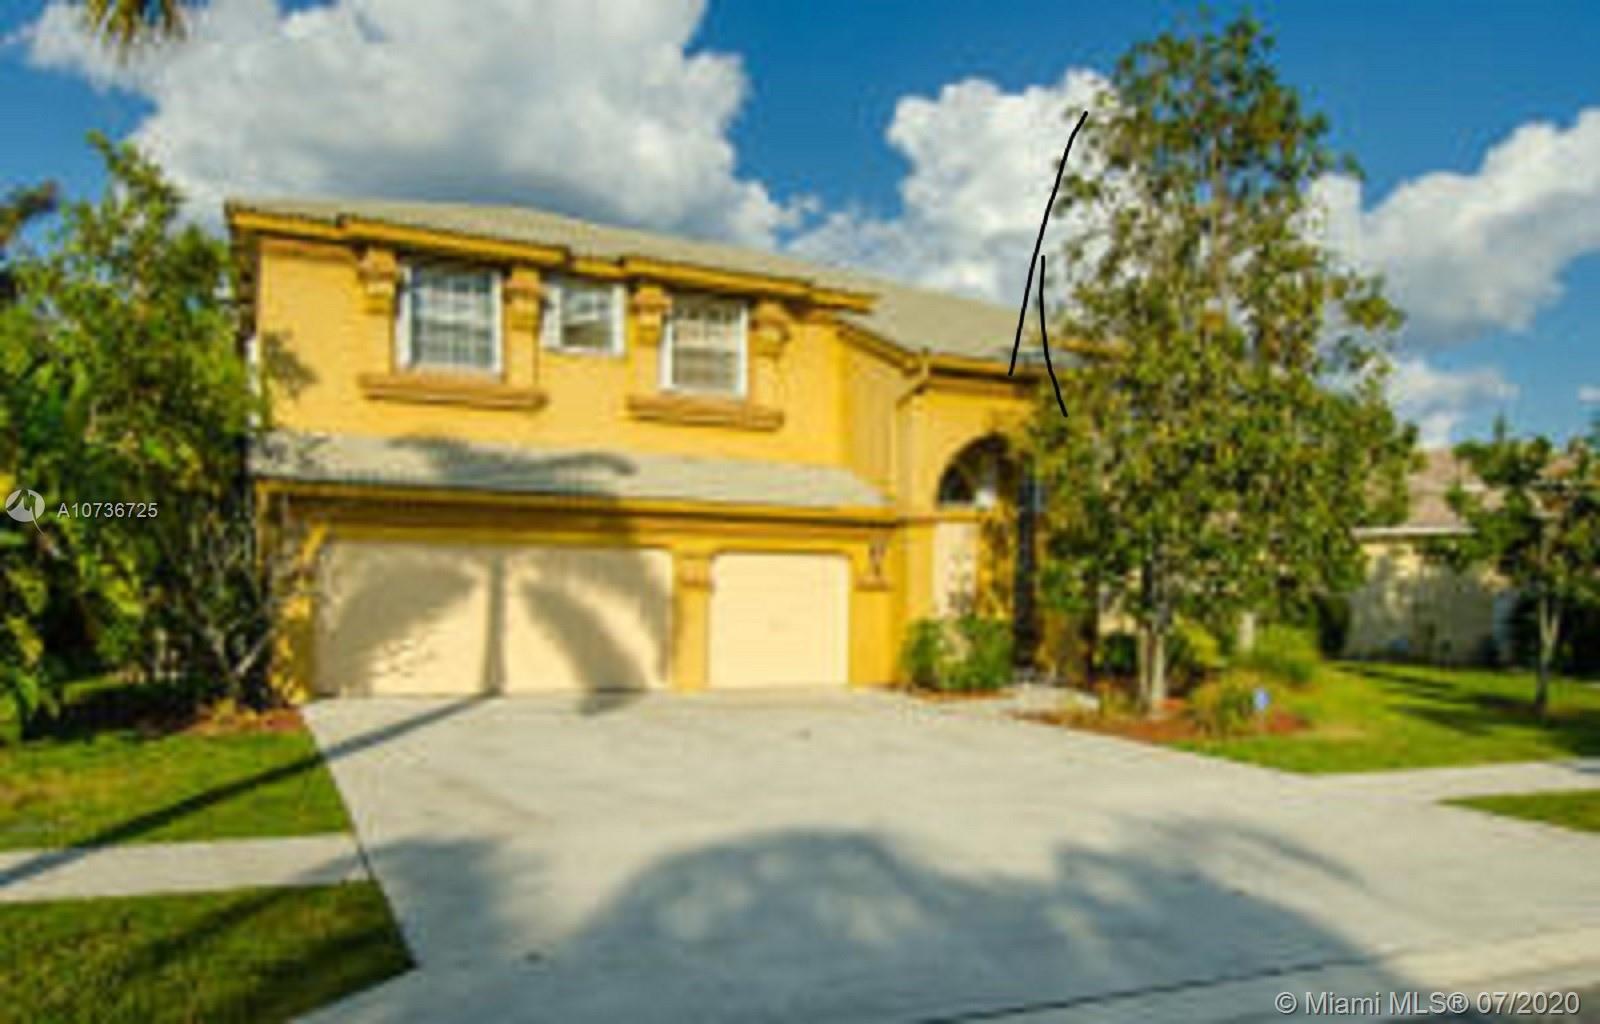 6464 Marbletree Ln, Lake Worth, FL 33467